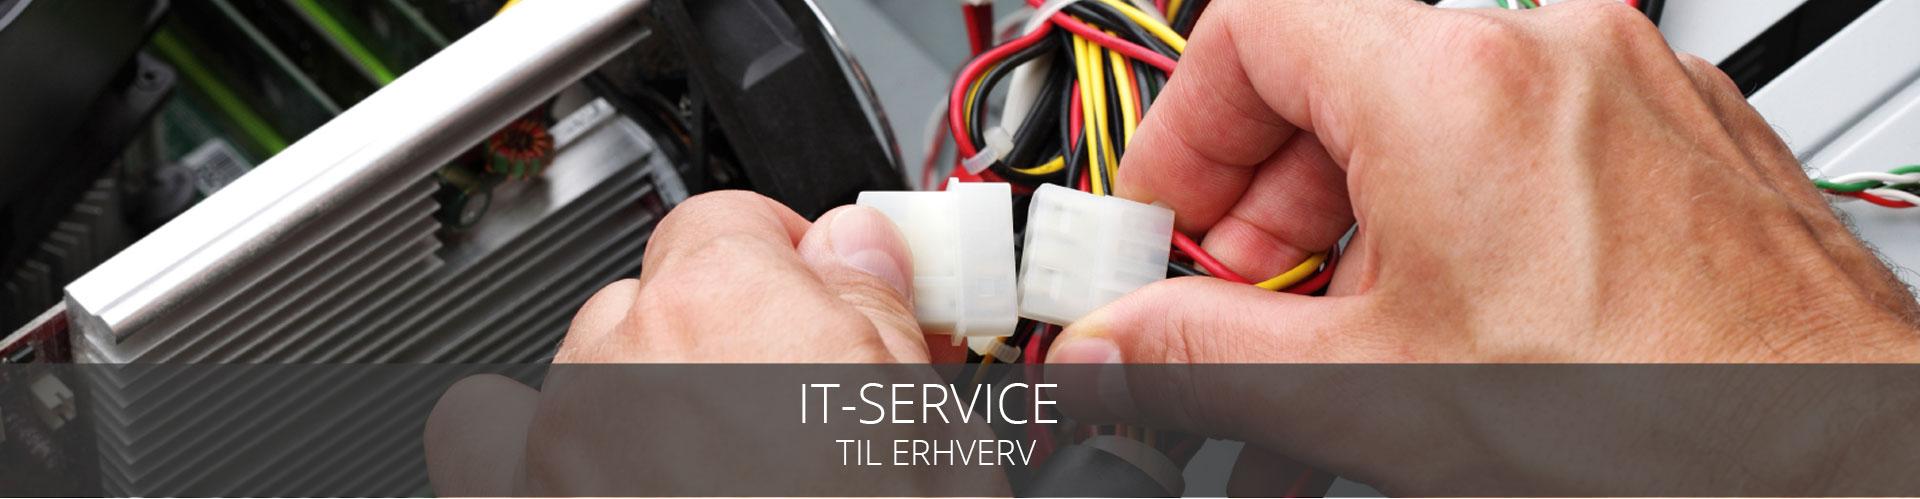 it-service-unicom